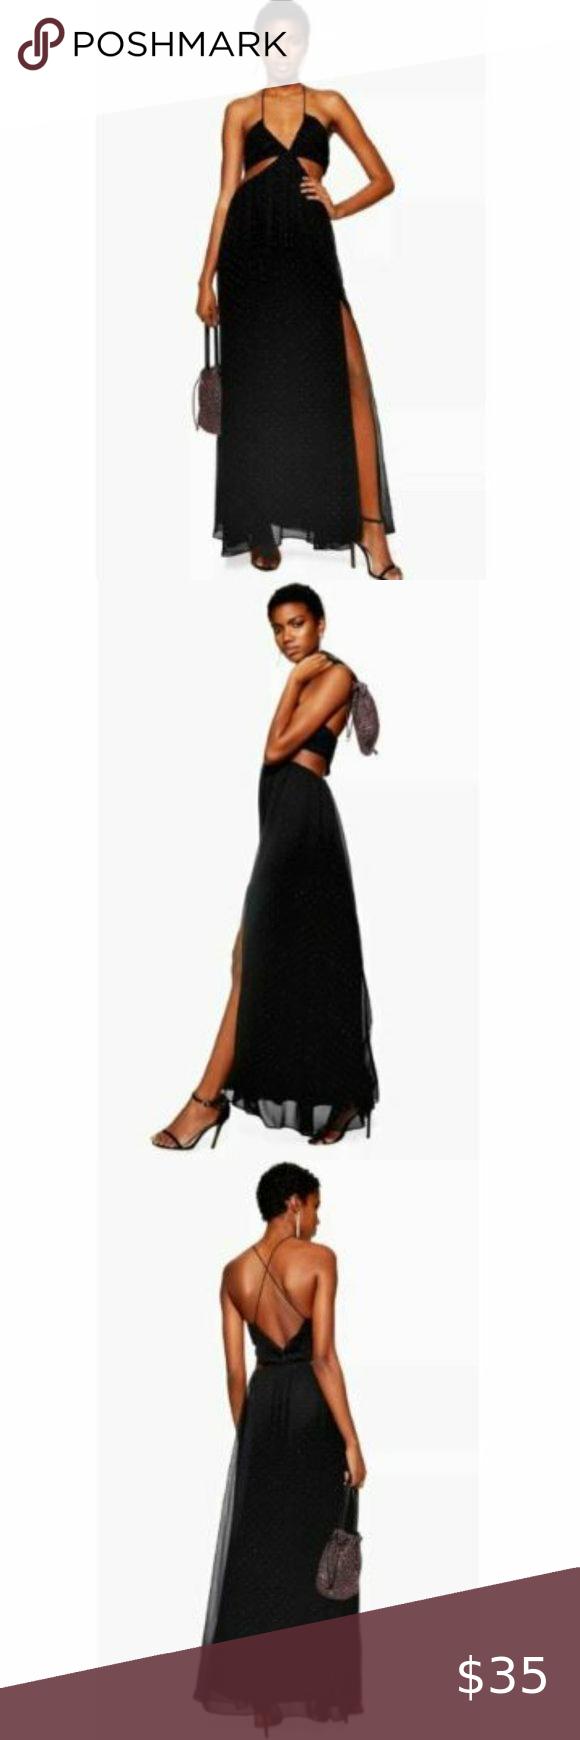 Topshop Black Rainbow Studded Cutout Maxi Dress 8 Cutout Maxi Dress Top Shop Dress Dresses [ 1740 x 580 Pixel ]